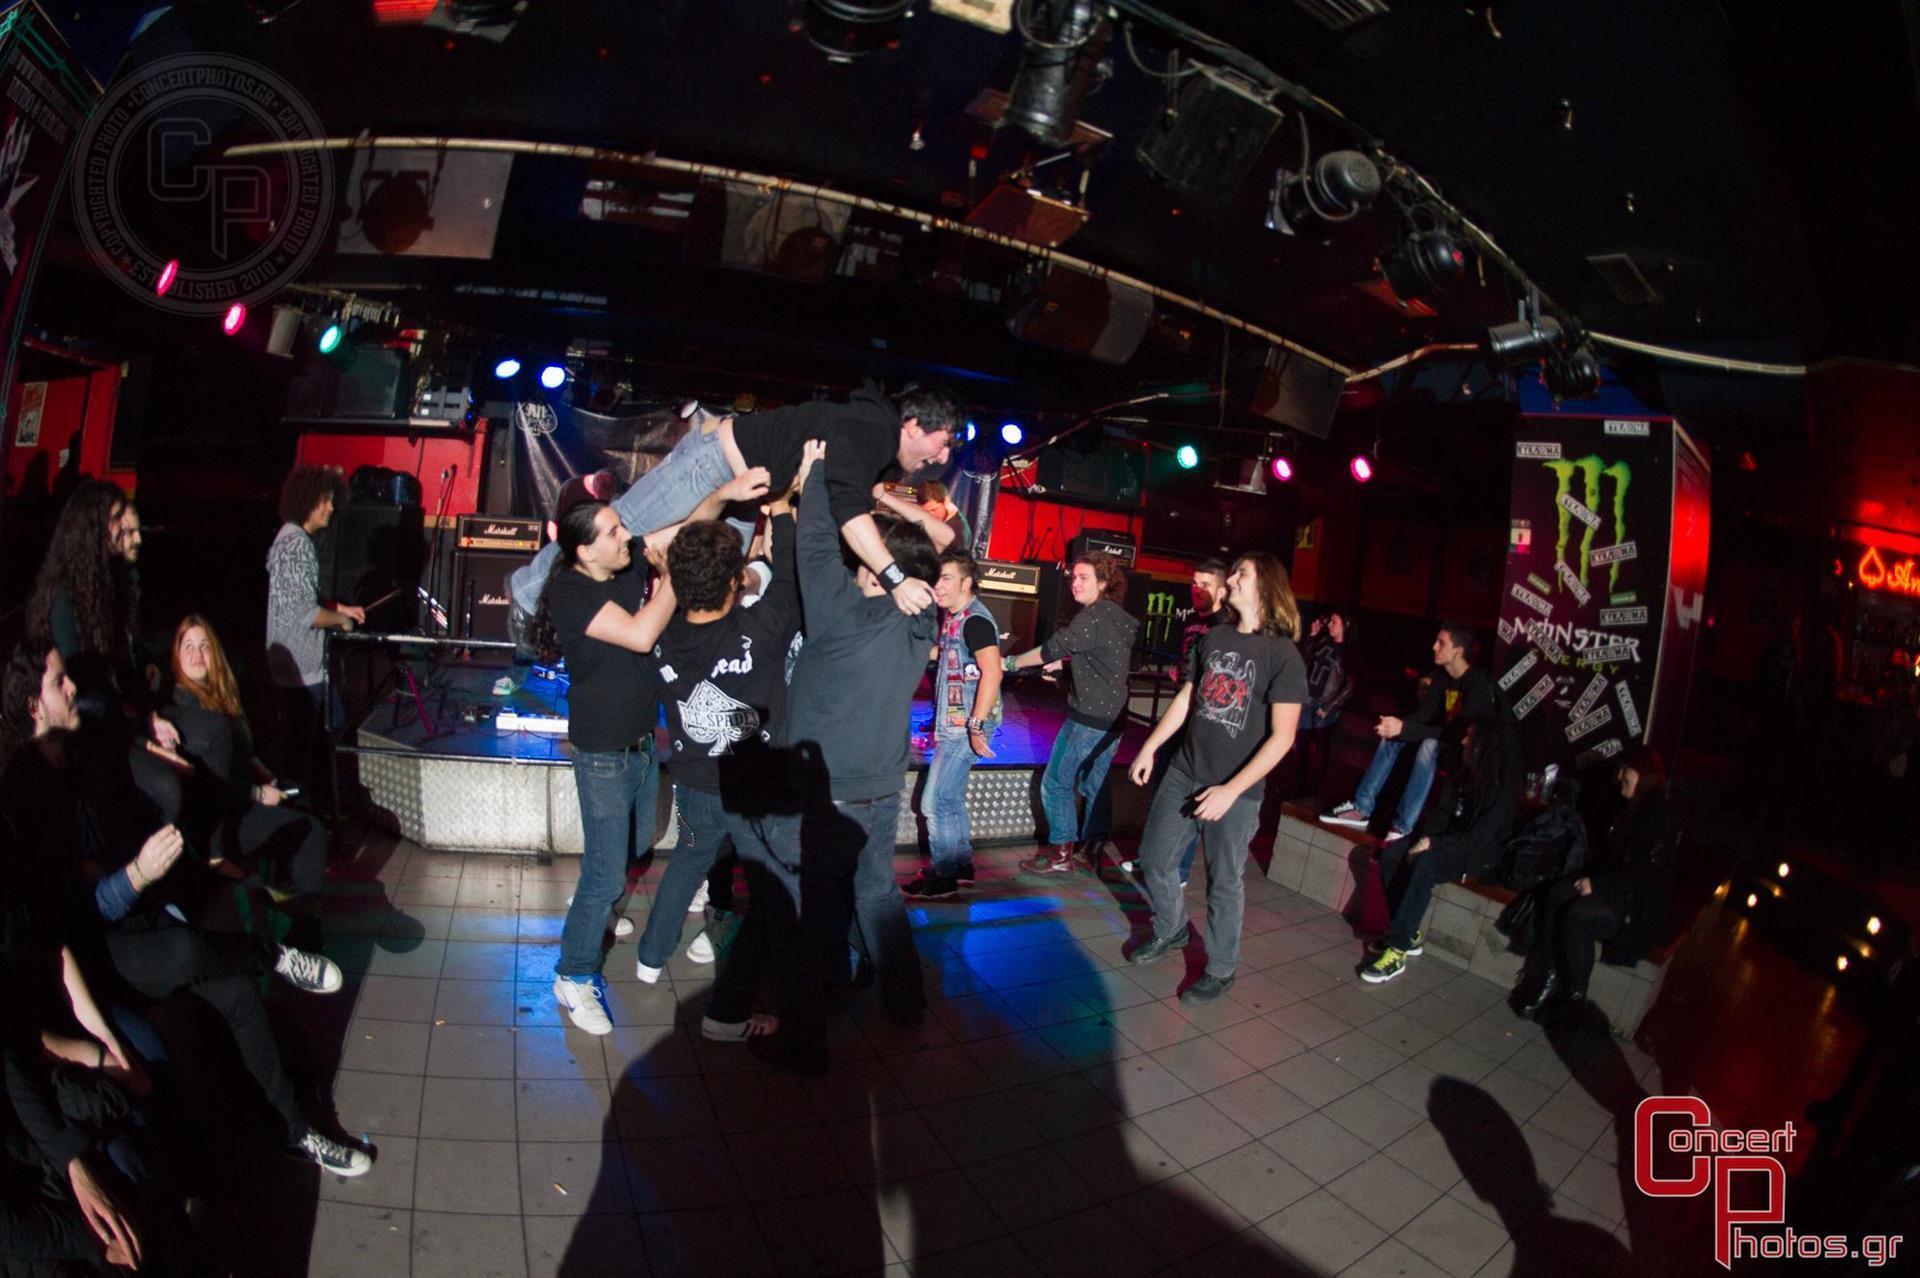 Battle Of The Bands Athens - Leg 3- photographer:  - ConcertPhotos - 20150104_2257_56